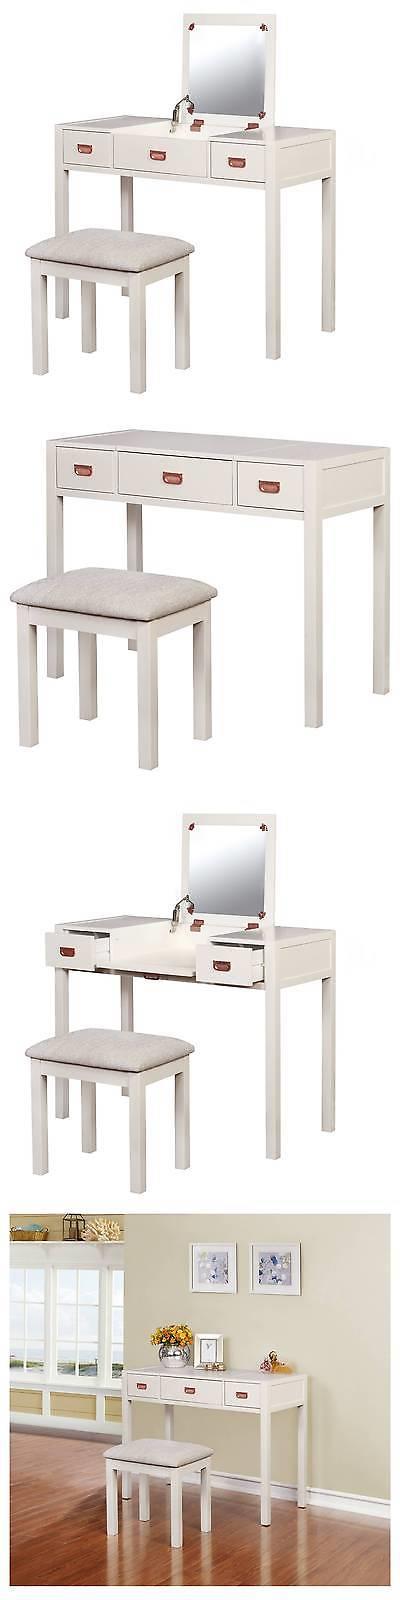 Sets 98478 Audrey Vanity Set - White - Linon -\u003e BUY IT NOW ONLY